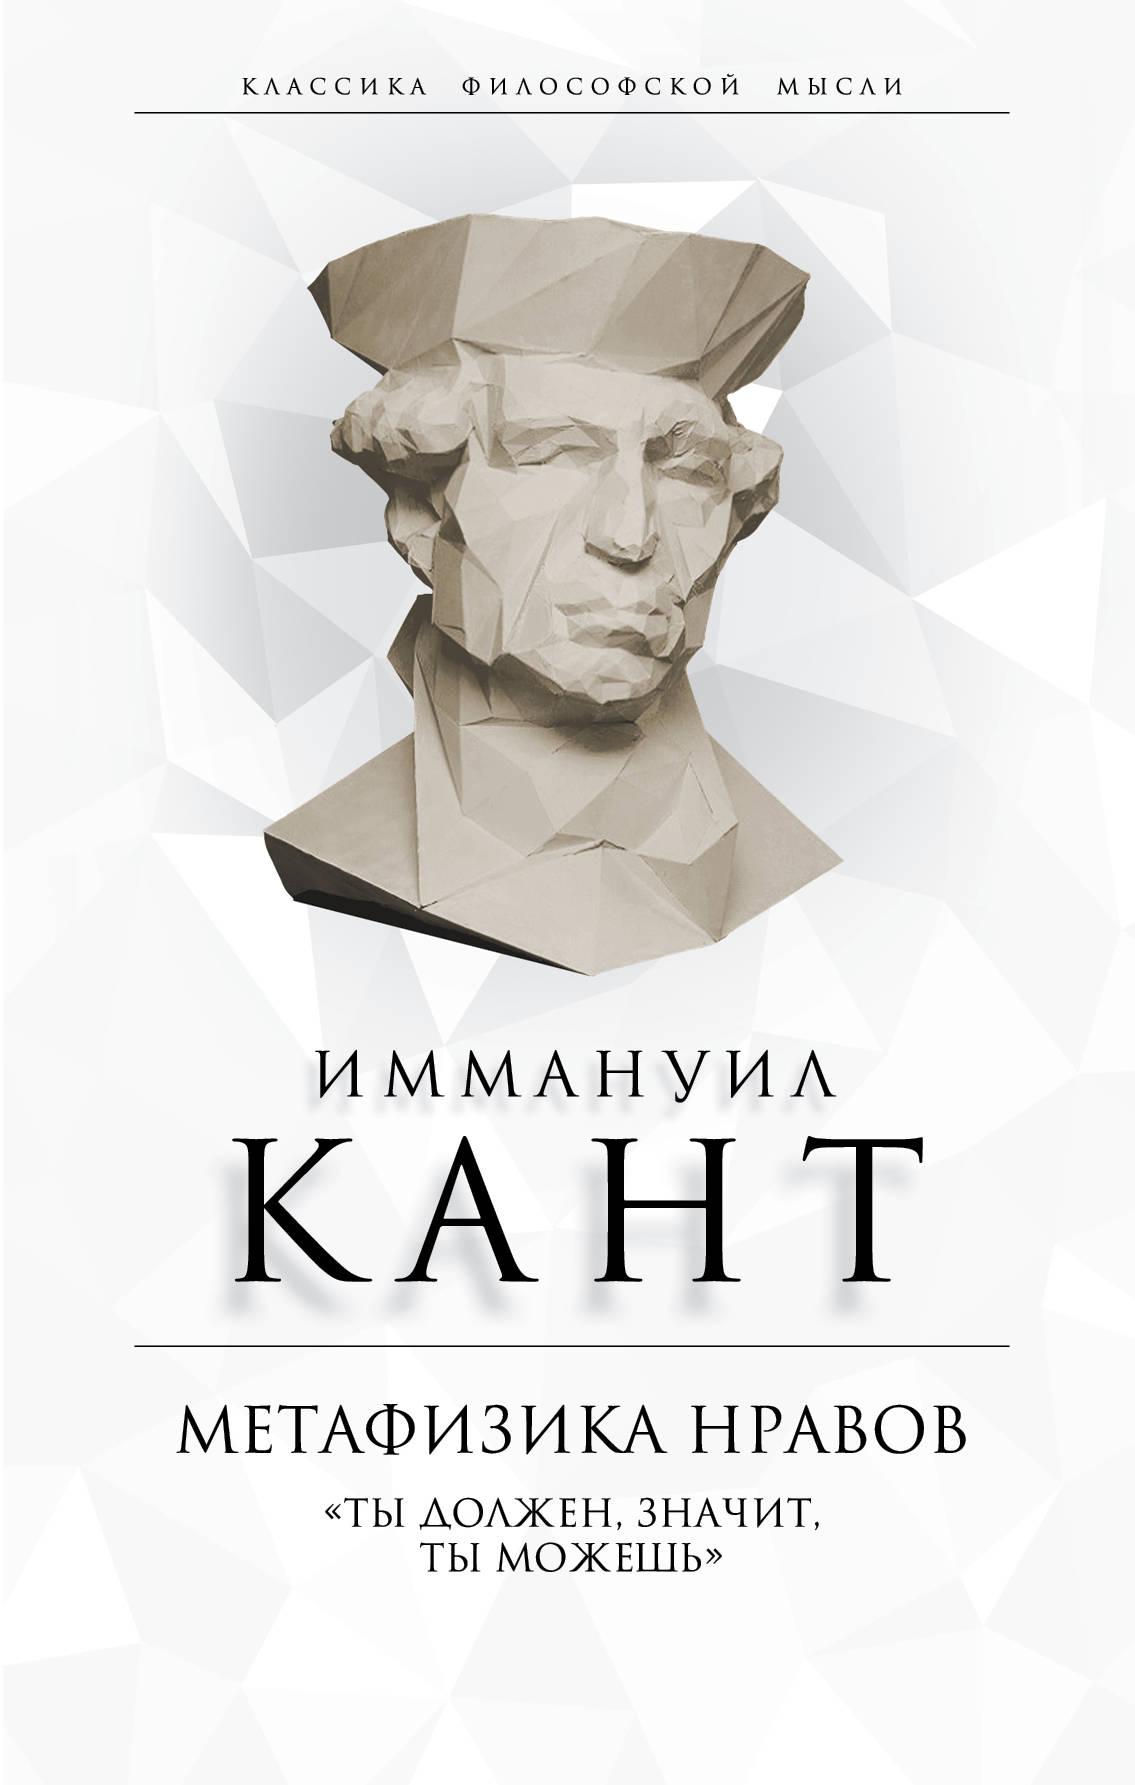 Кант Иммануил Метафизика нравов. «Ты должен, значит, ты можешь»